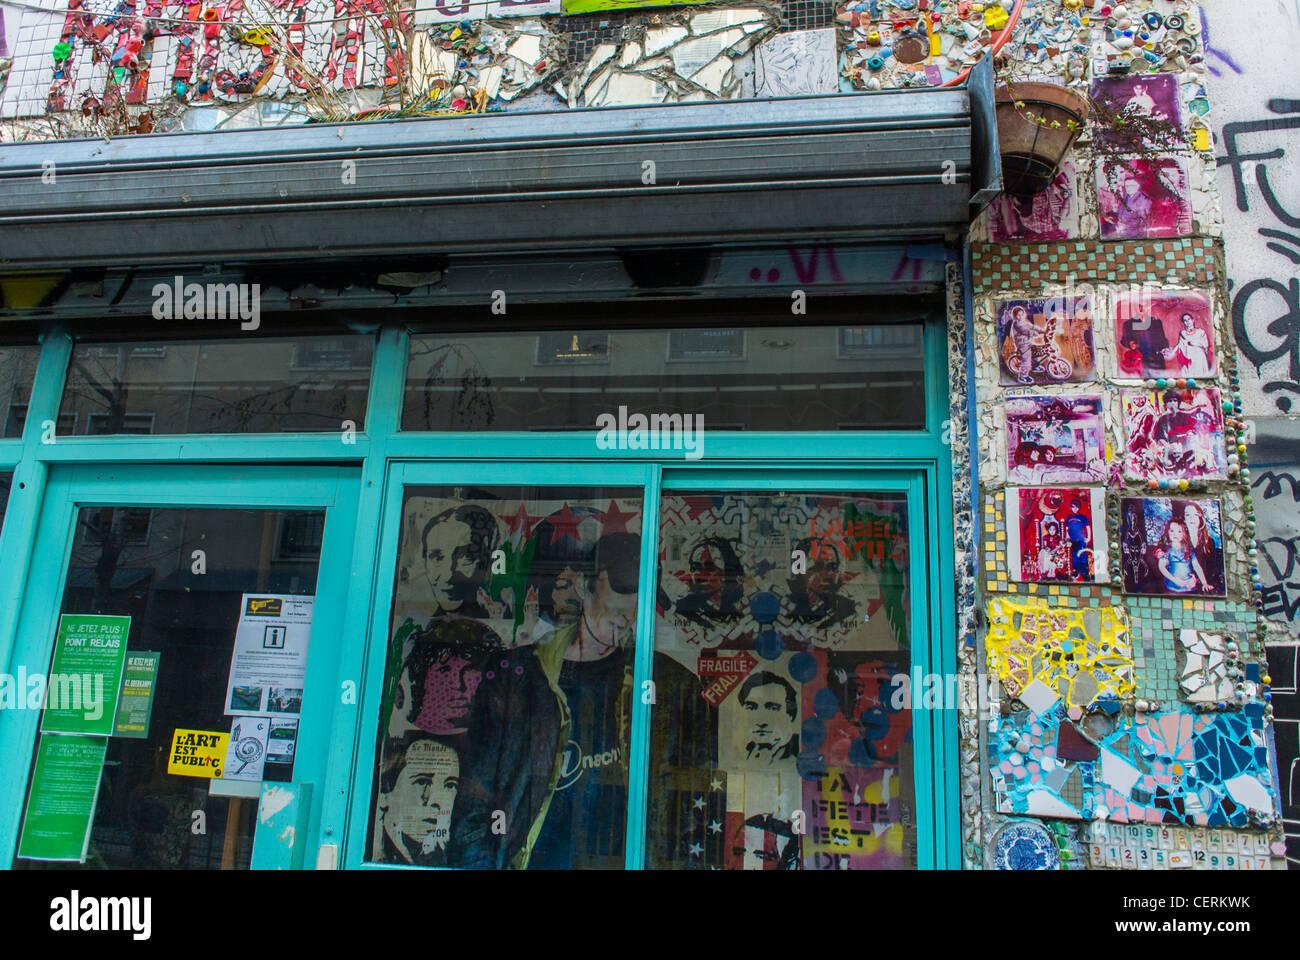 Paris, France, Old Storefront in Belleville District, Graffiti Street Art - Stock Image